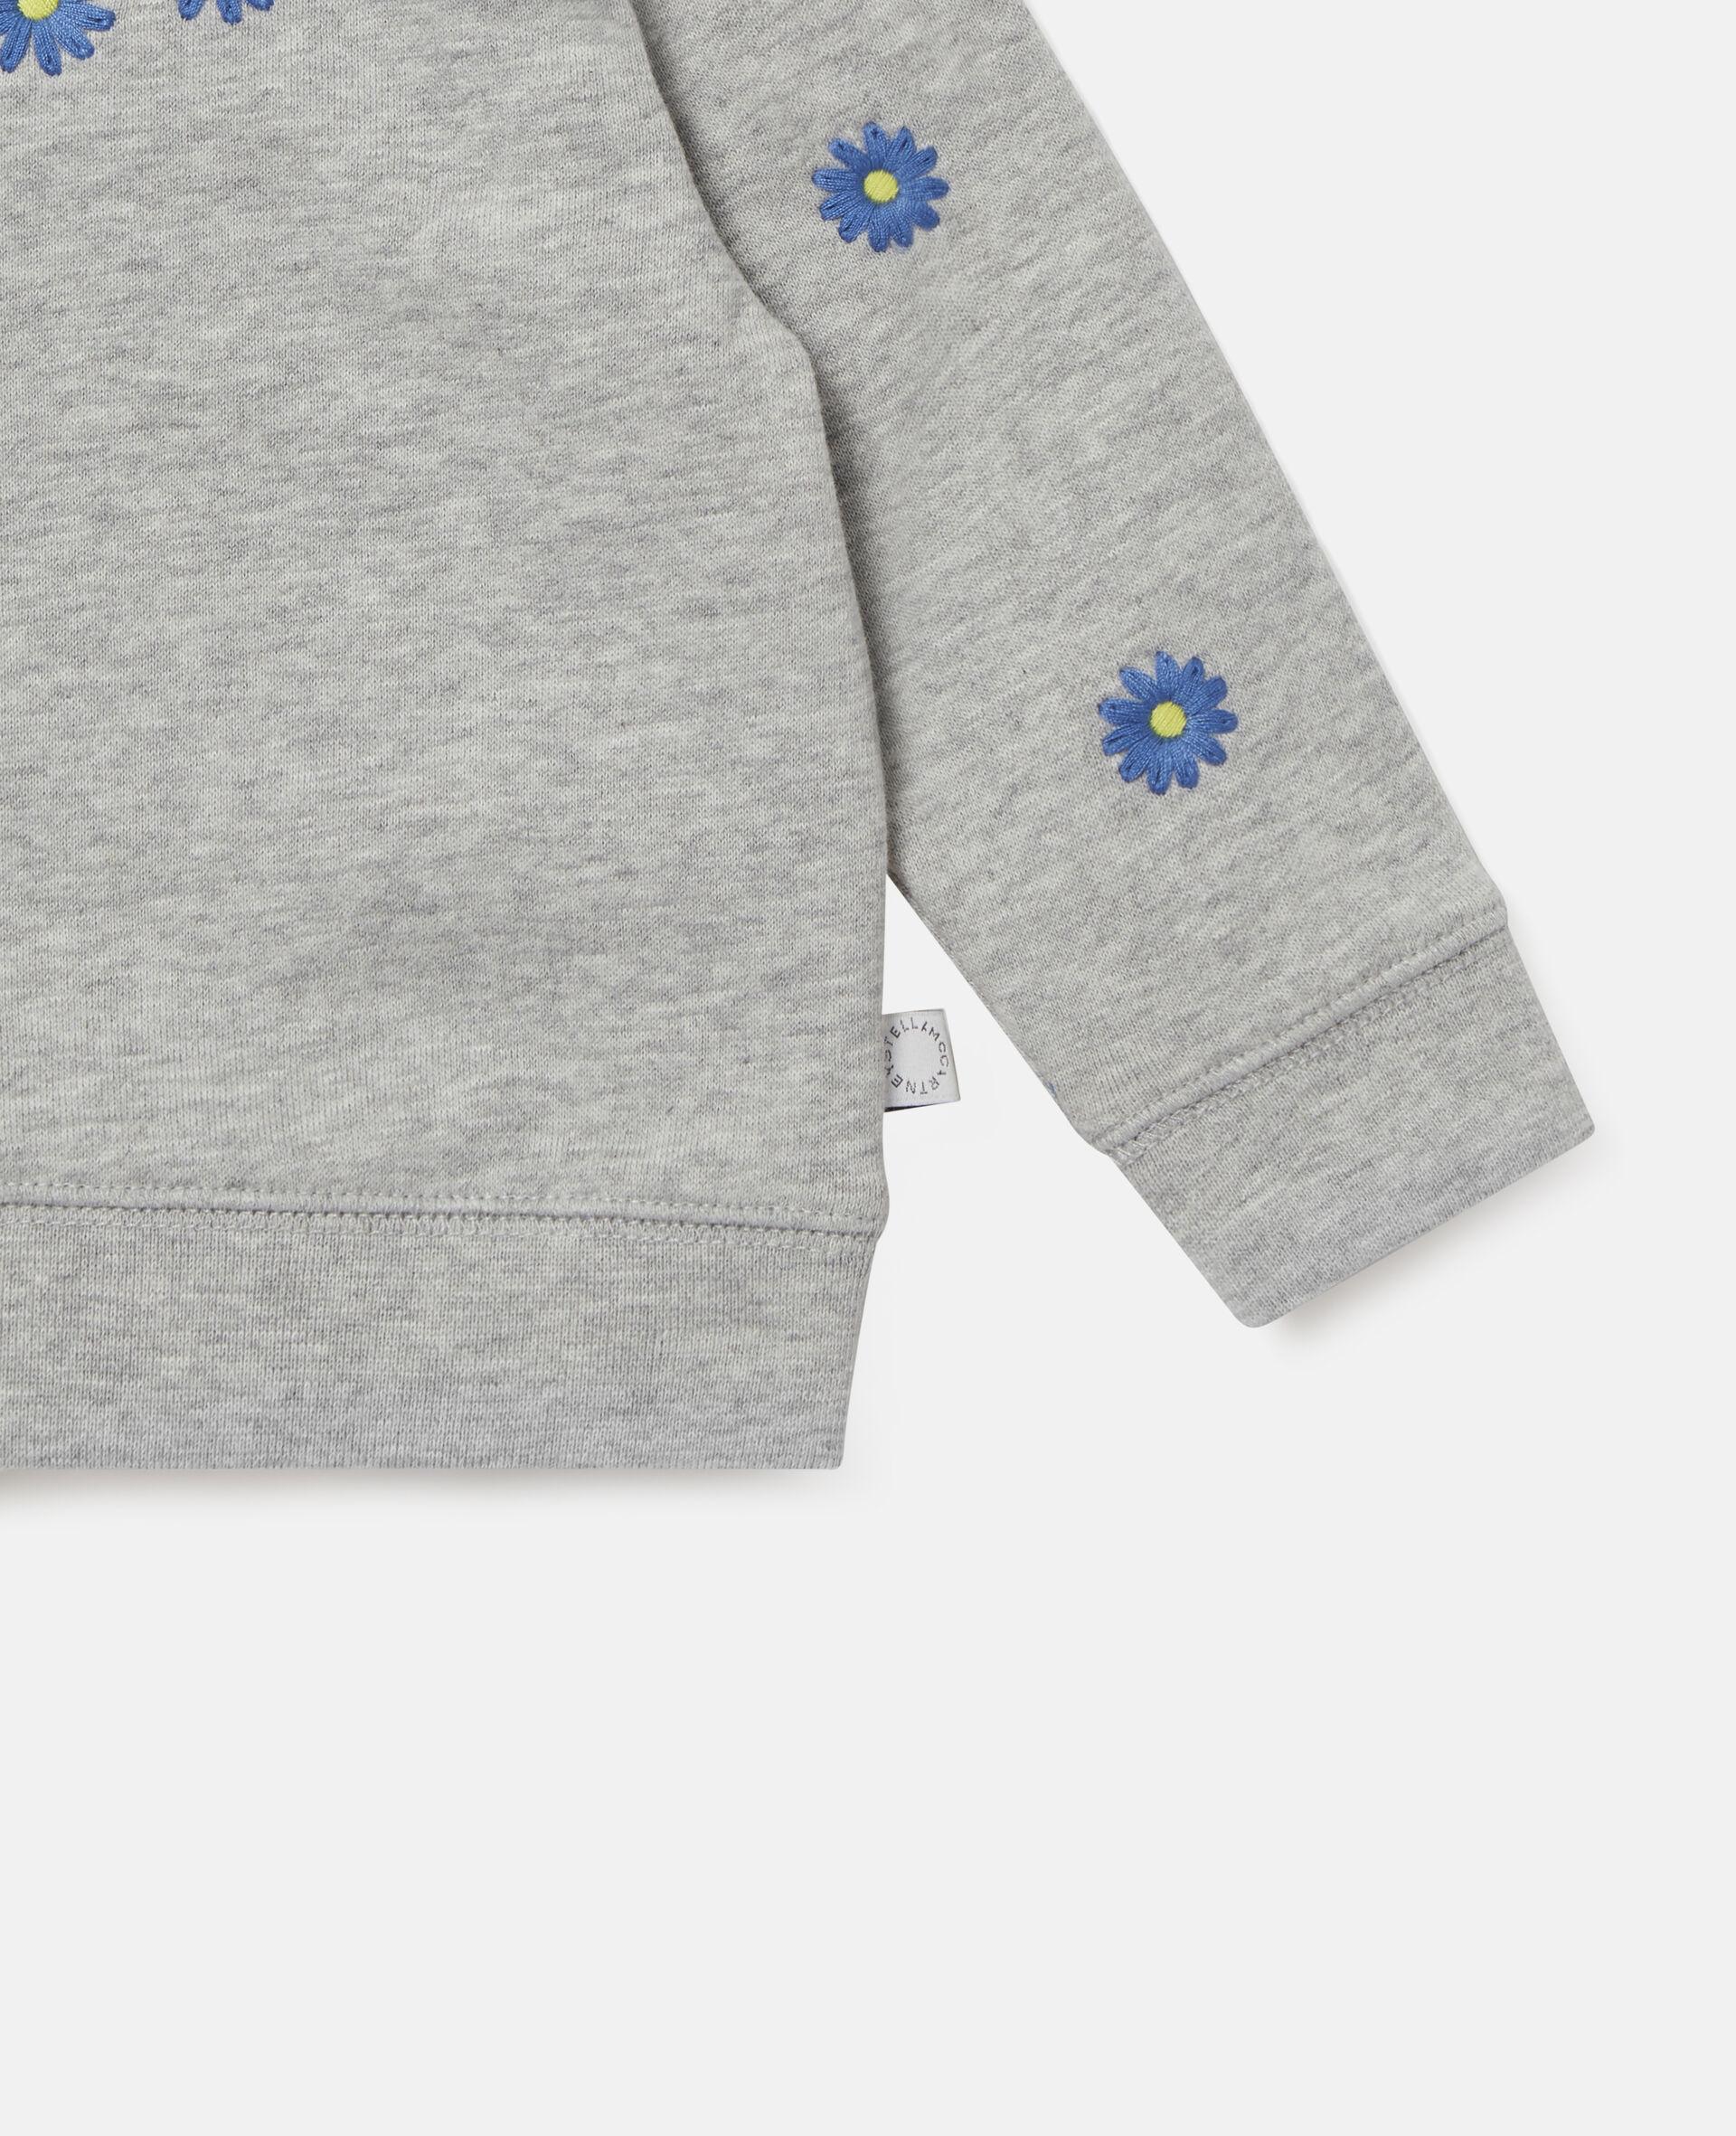 Fleece-Sweatshirt mit Gänseblümchenstickerei -Grau-large image number 2